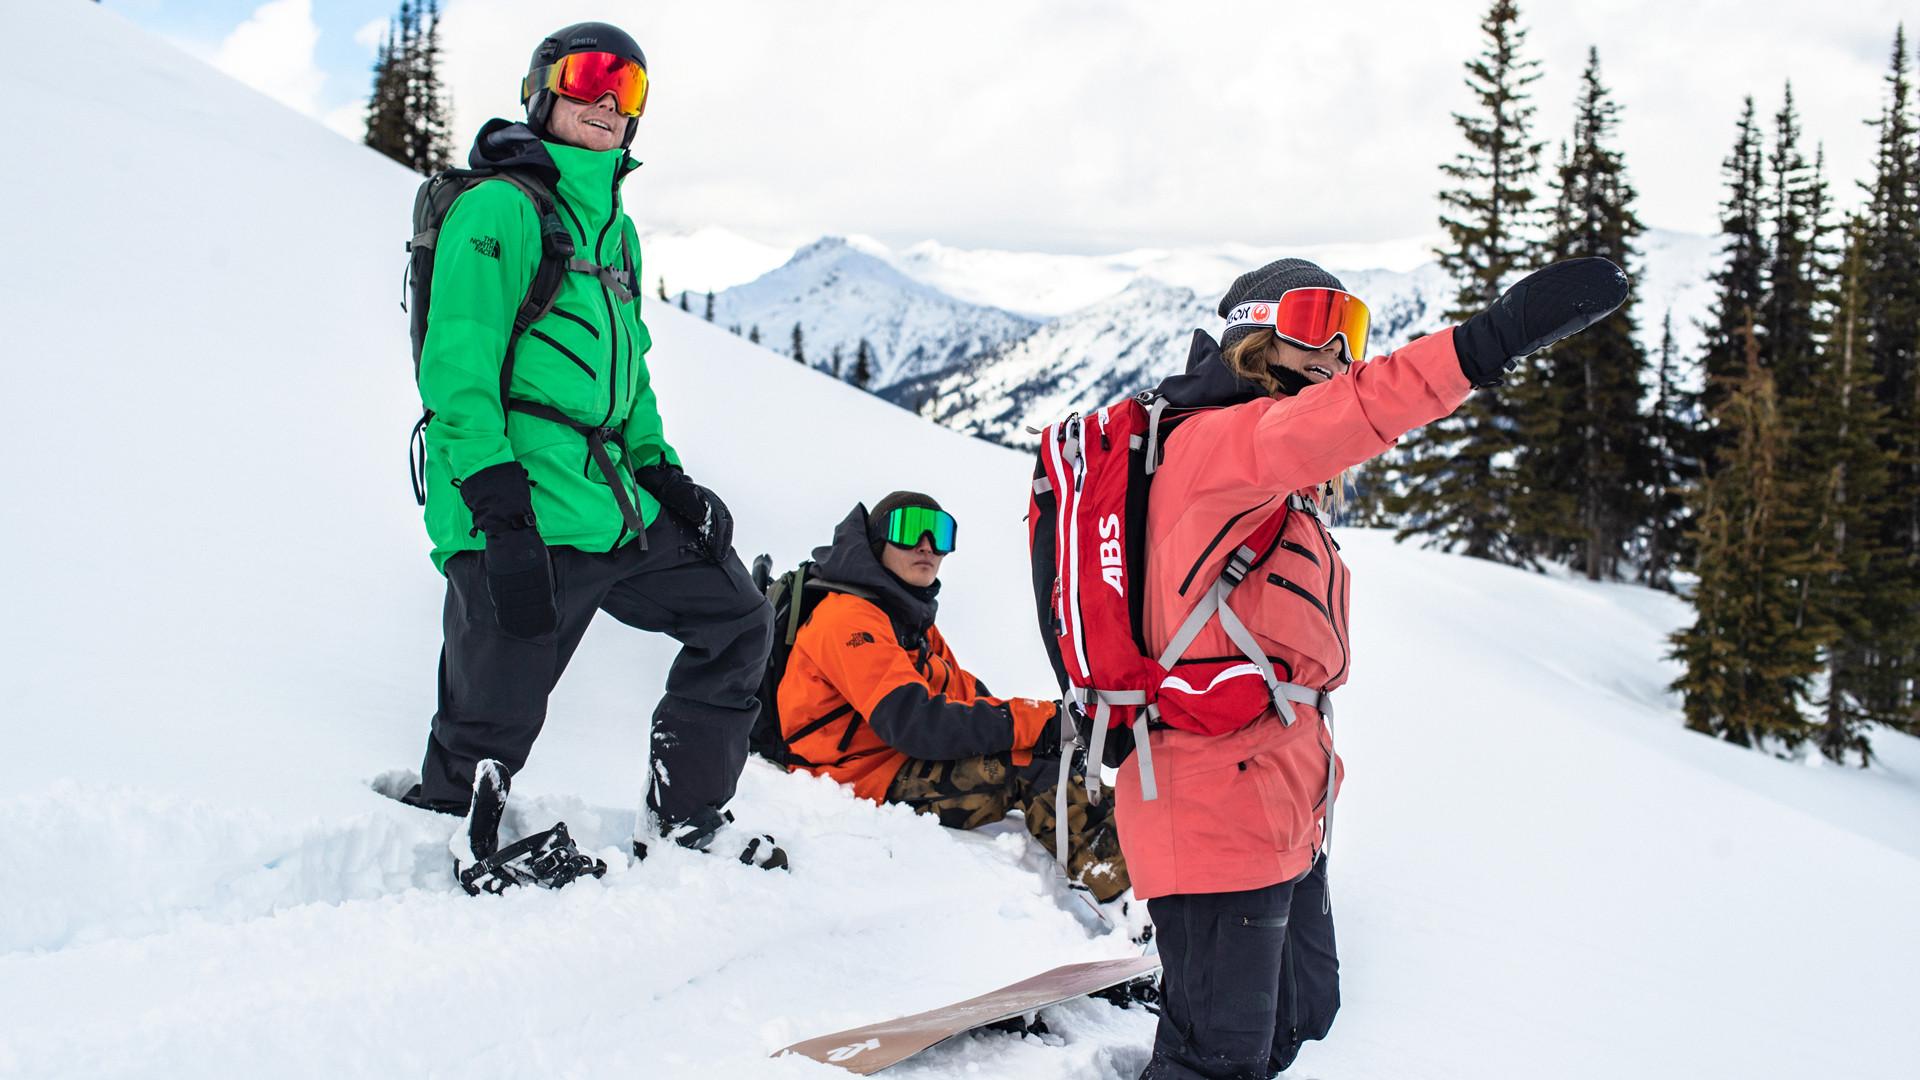 The North Face snowboard/ski jacket